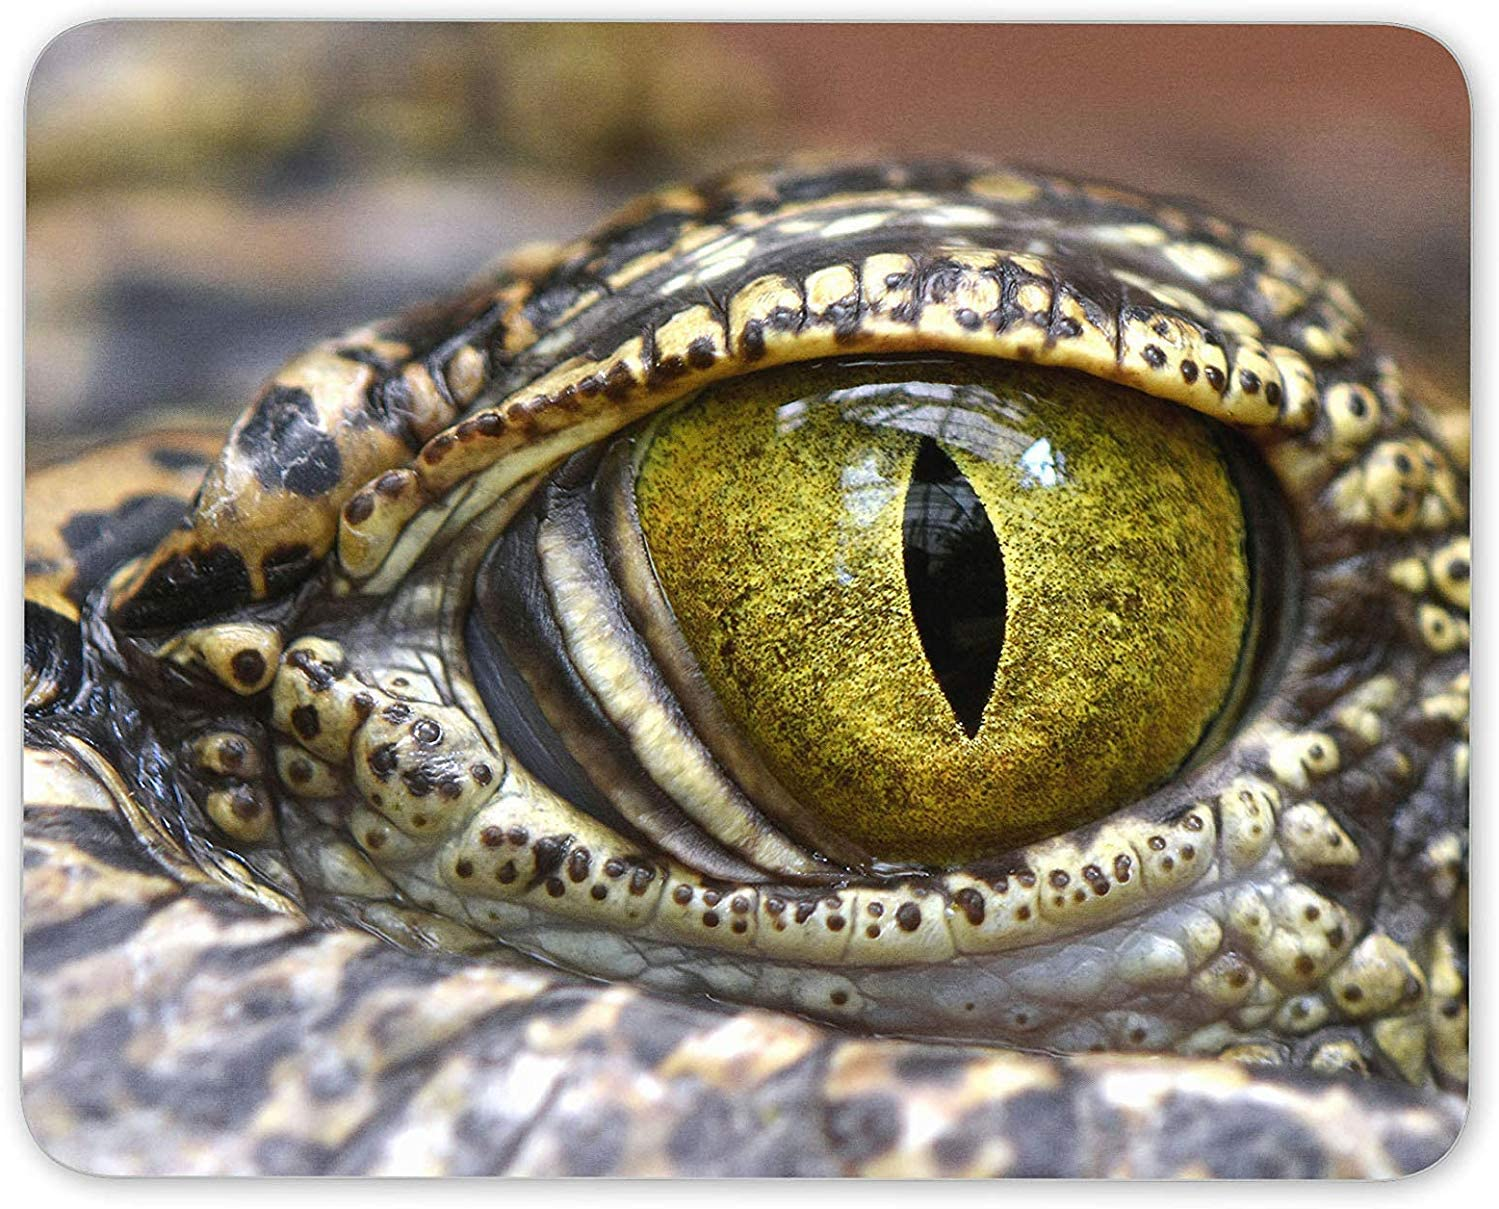 J5E7JYTE Crocodile Alligator Eye Mouse Mat Pad - Aquatic Reptile ...